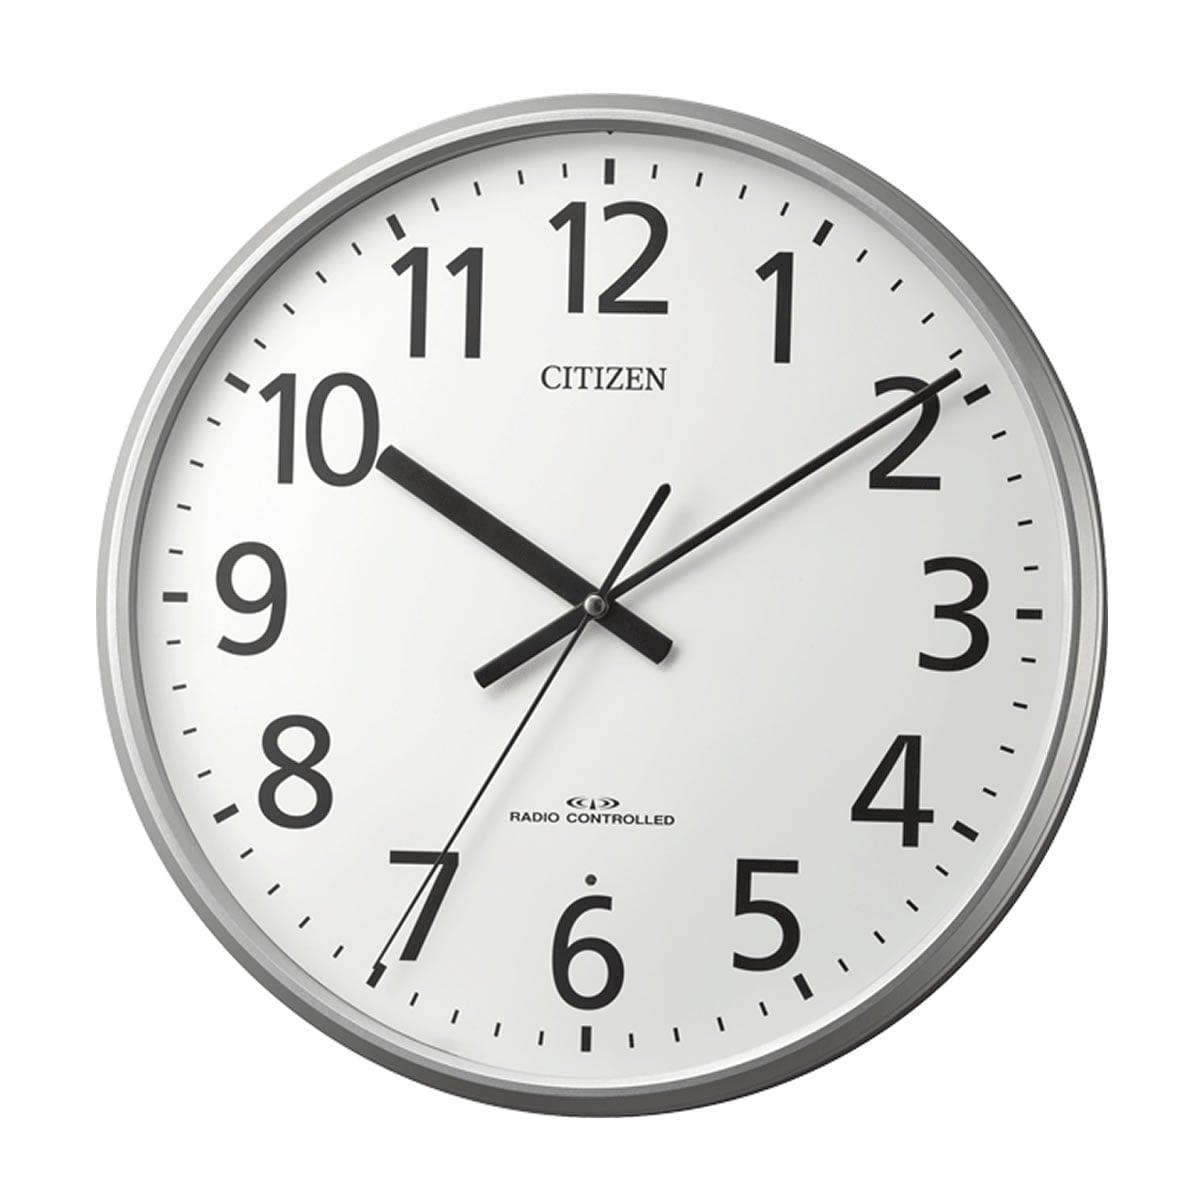 CITIZEN(シチズン)電波掛け時計 8MYA39-019